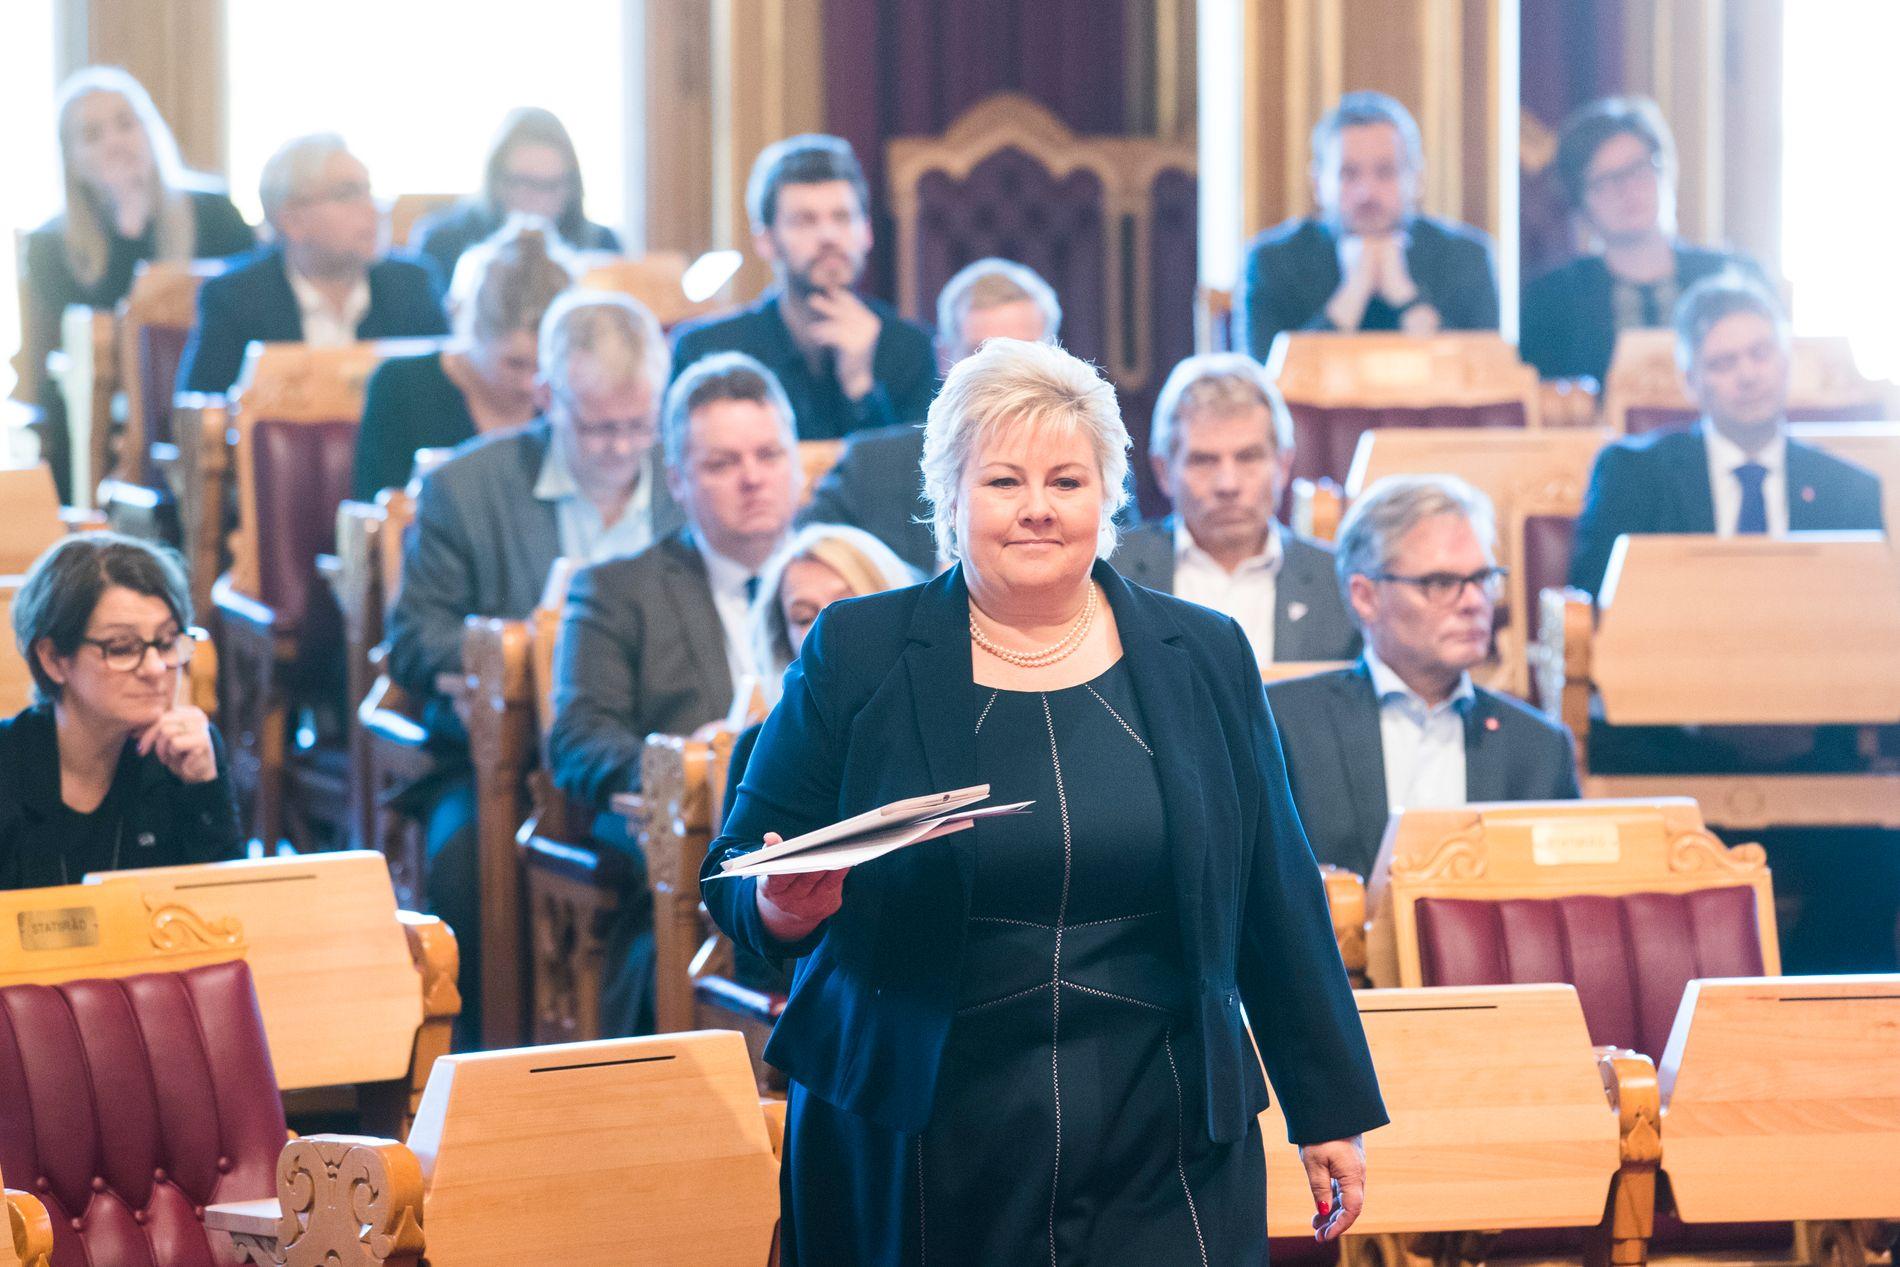 KARBON-SVAR: 18. oktober var statsminister Erna Solberg (H) i Stortinget og svarte på spørsmål i spontanspørretimen – blant annet om karbonfangst og lagring,